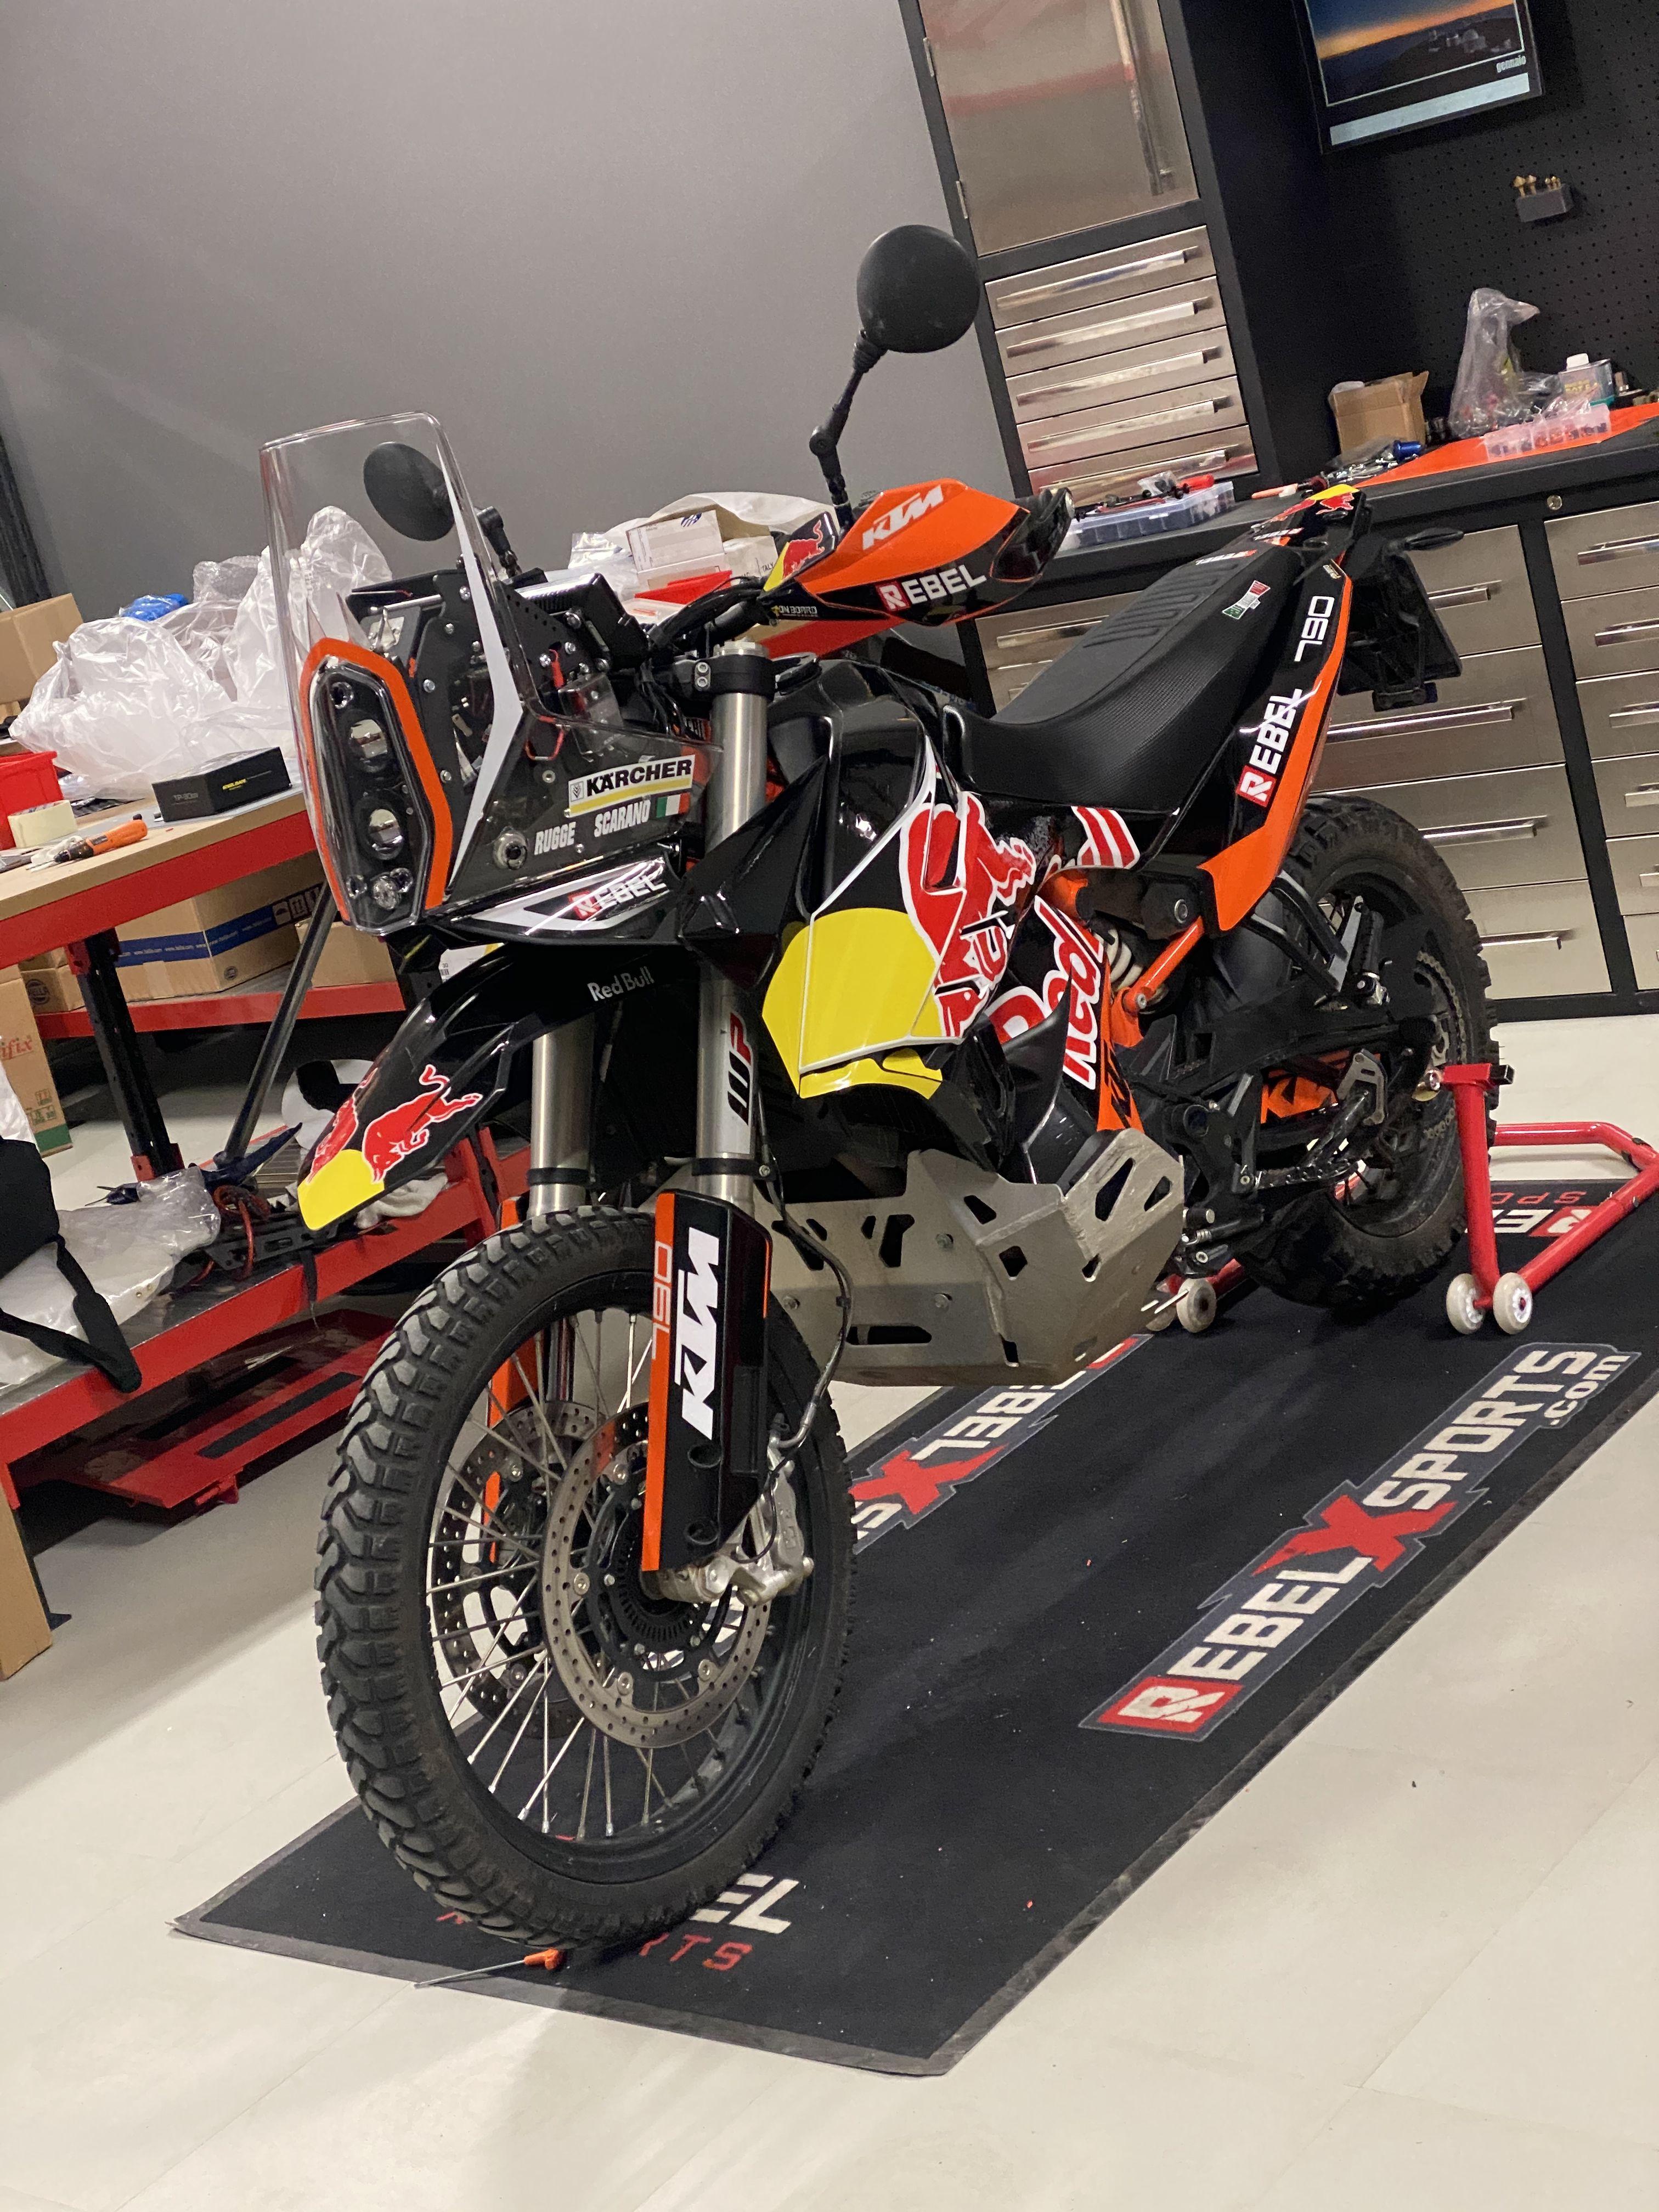 Ktm 790 Rally Kit In 2021 Ktm Ktm Adventure Adventure Bike